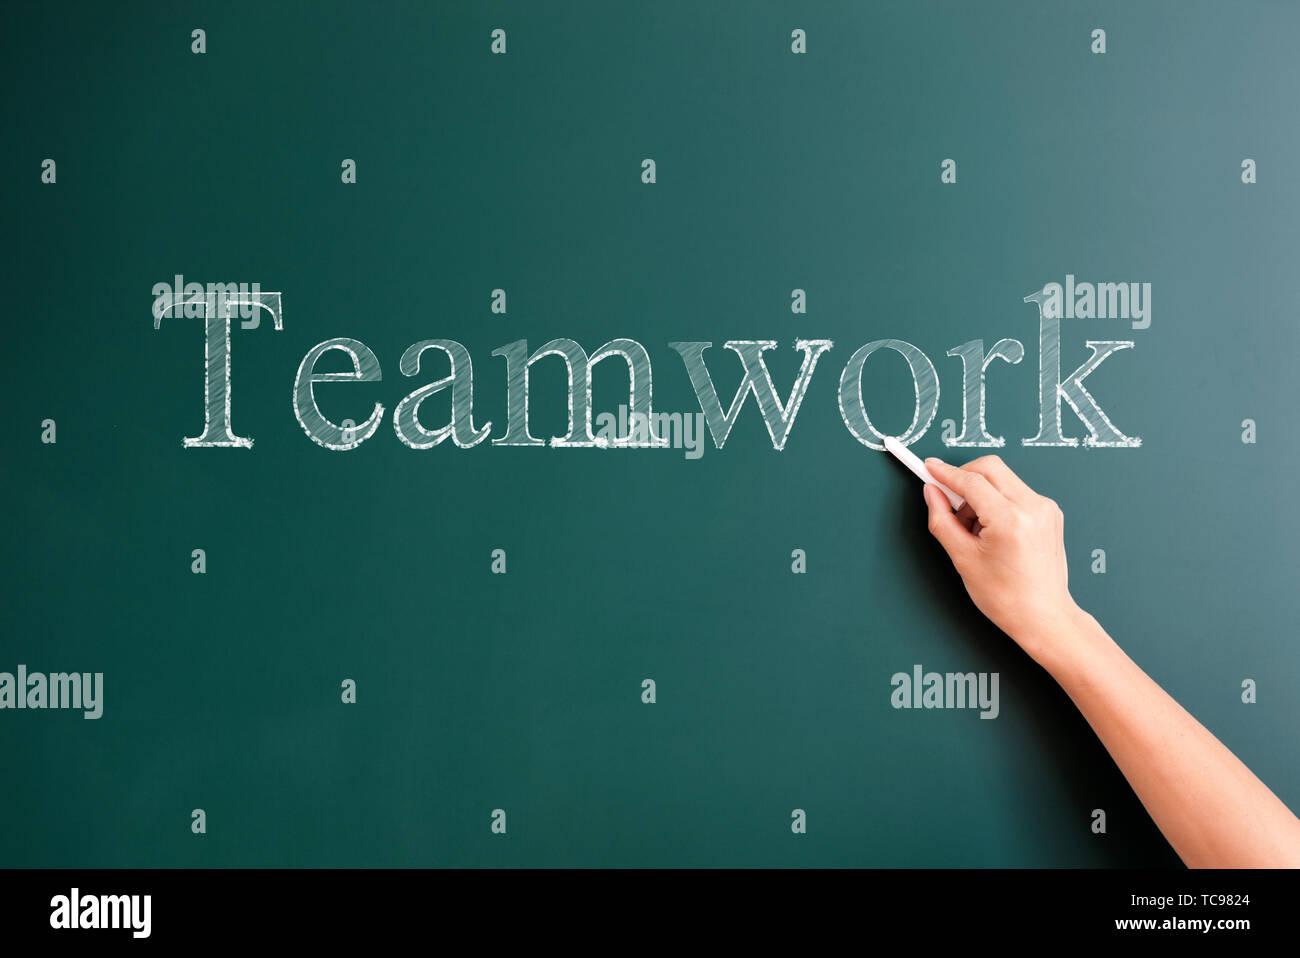 teamwork written on blackboard - Stock Image